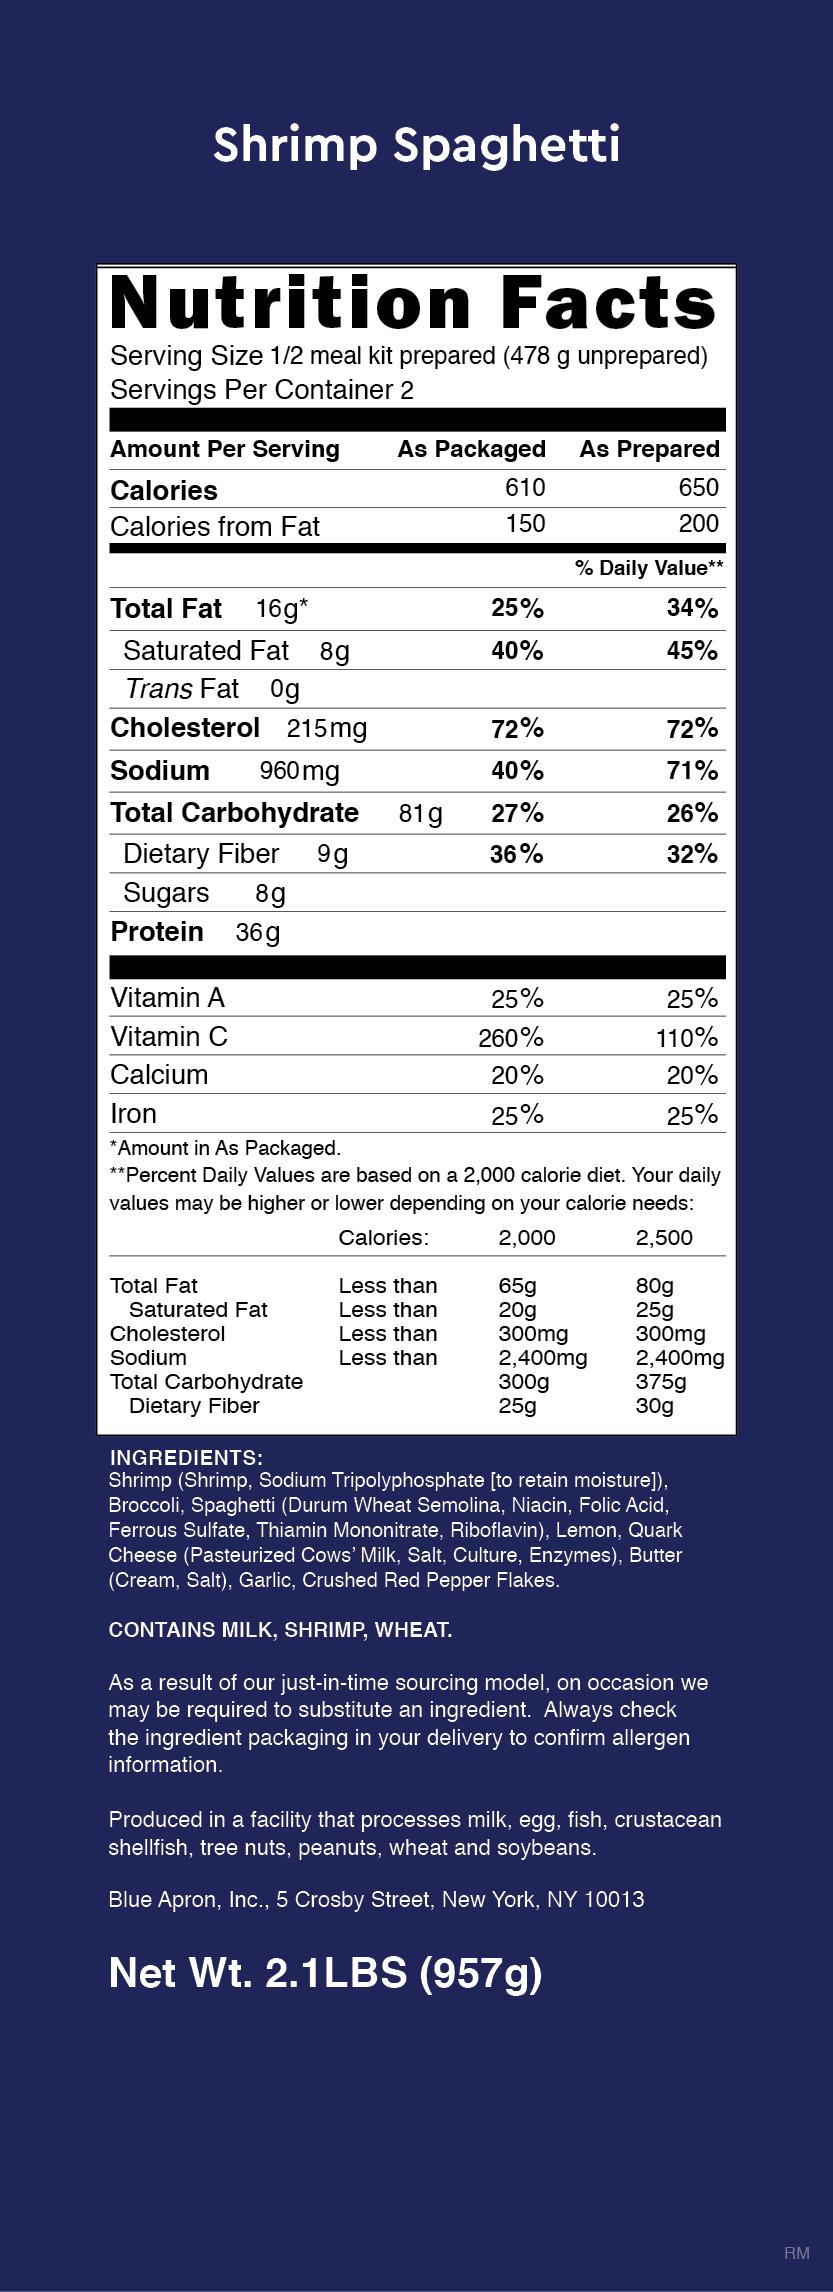 Blue apron unhealthy - Nutrition Label